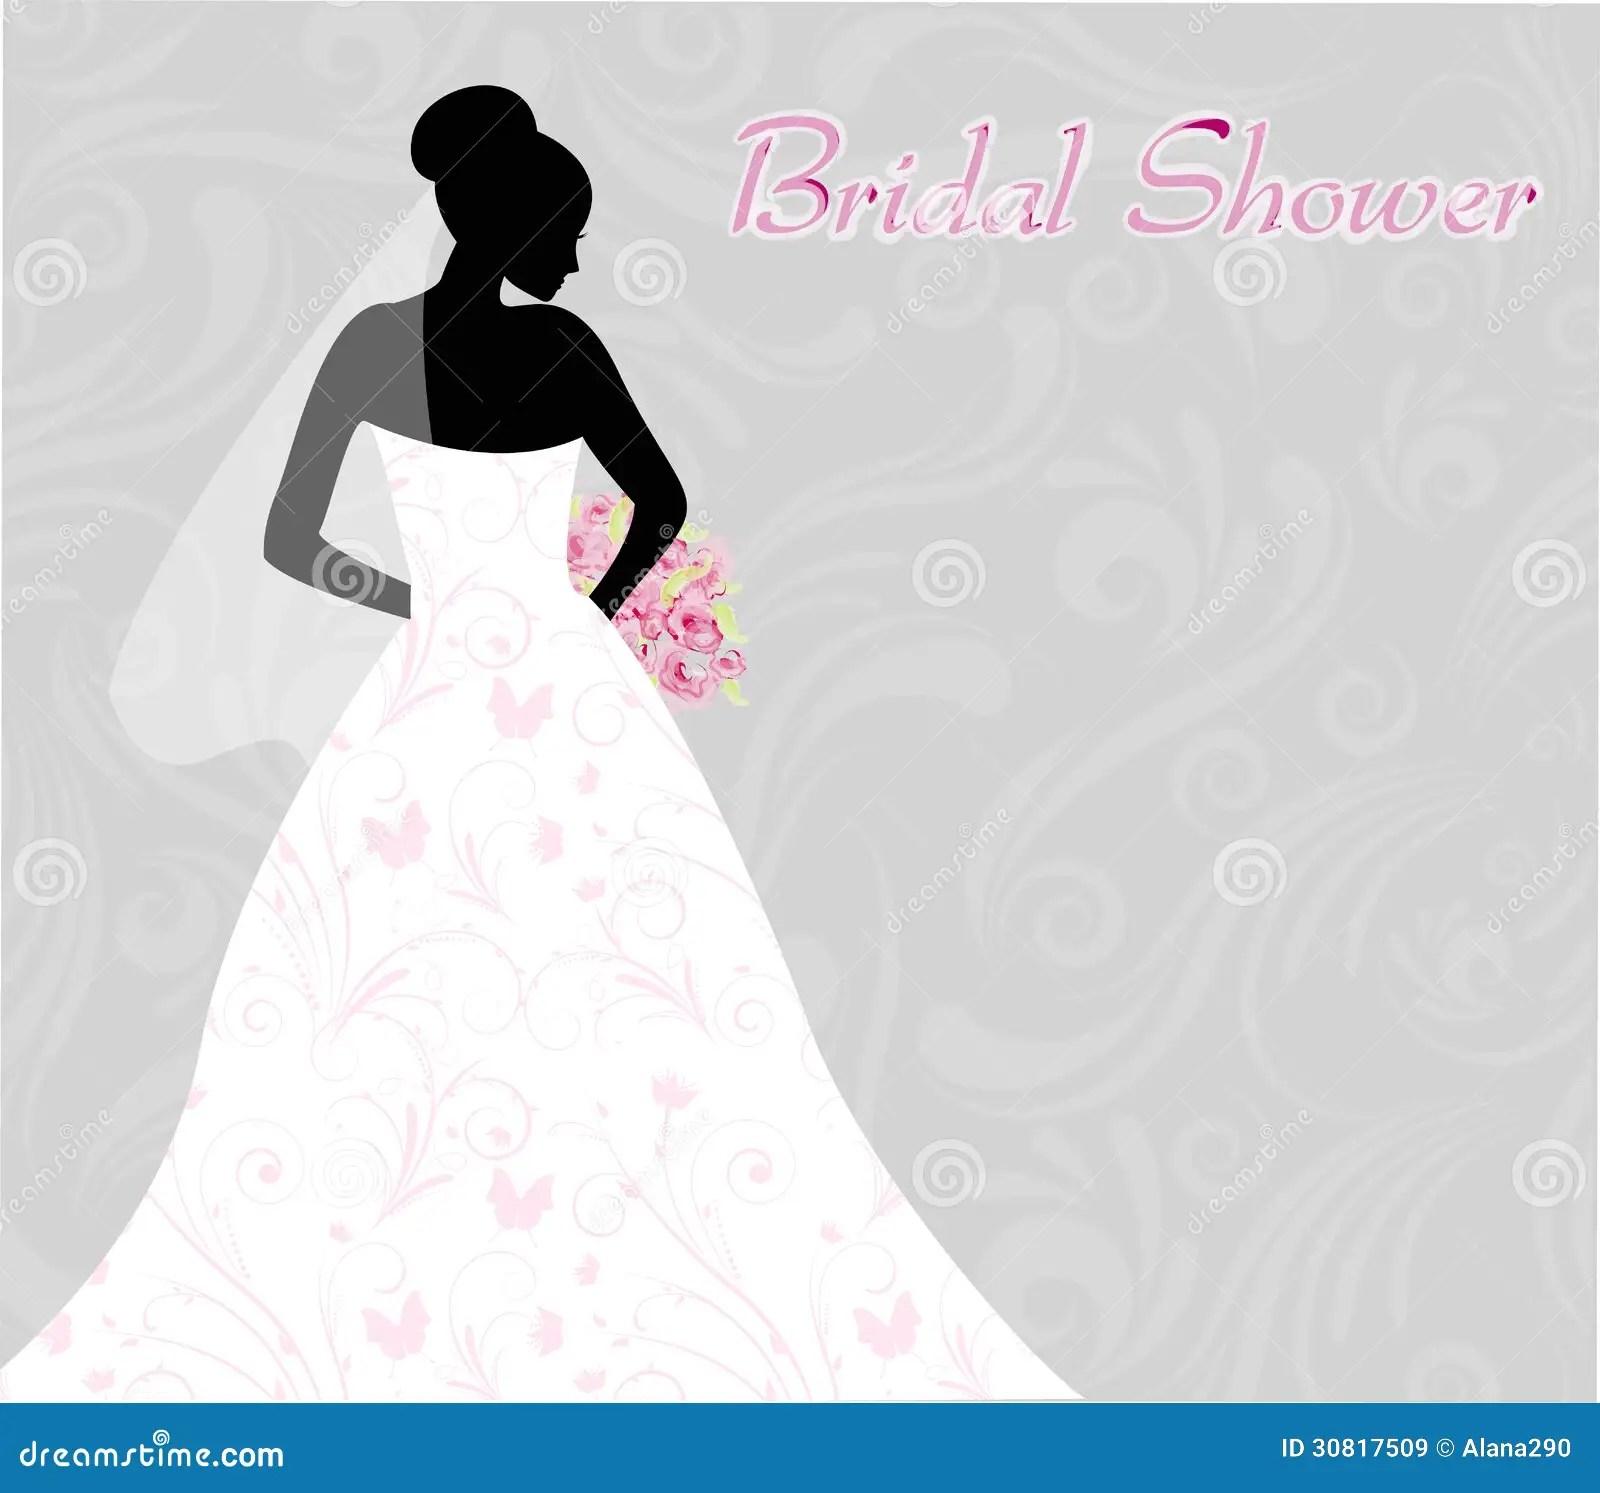 Bridal Shower Invitations Dress Silhouette